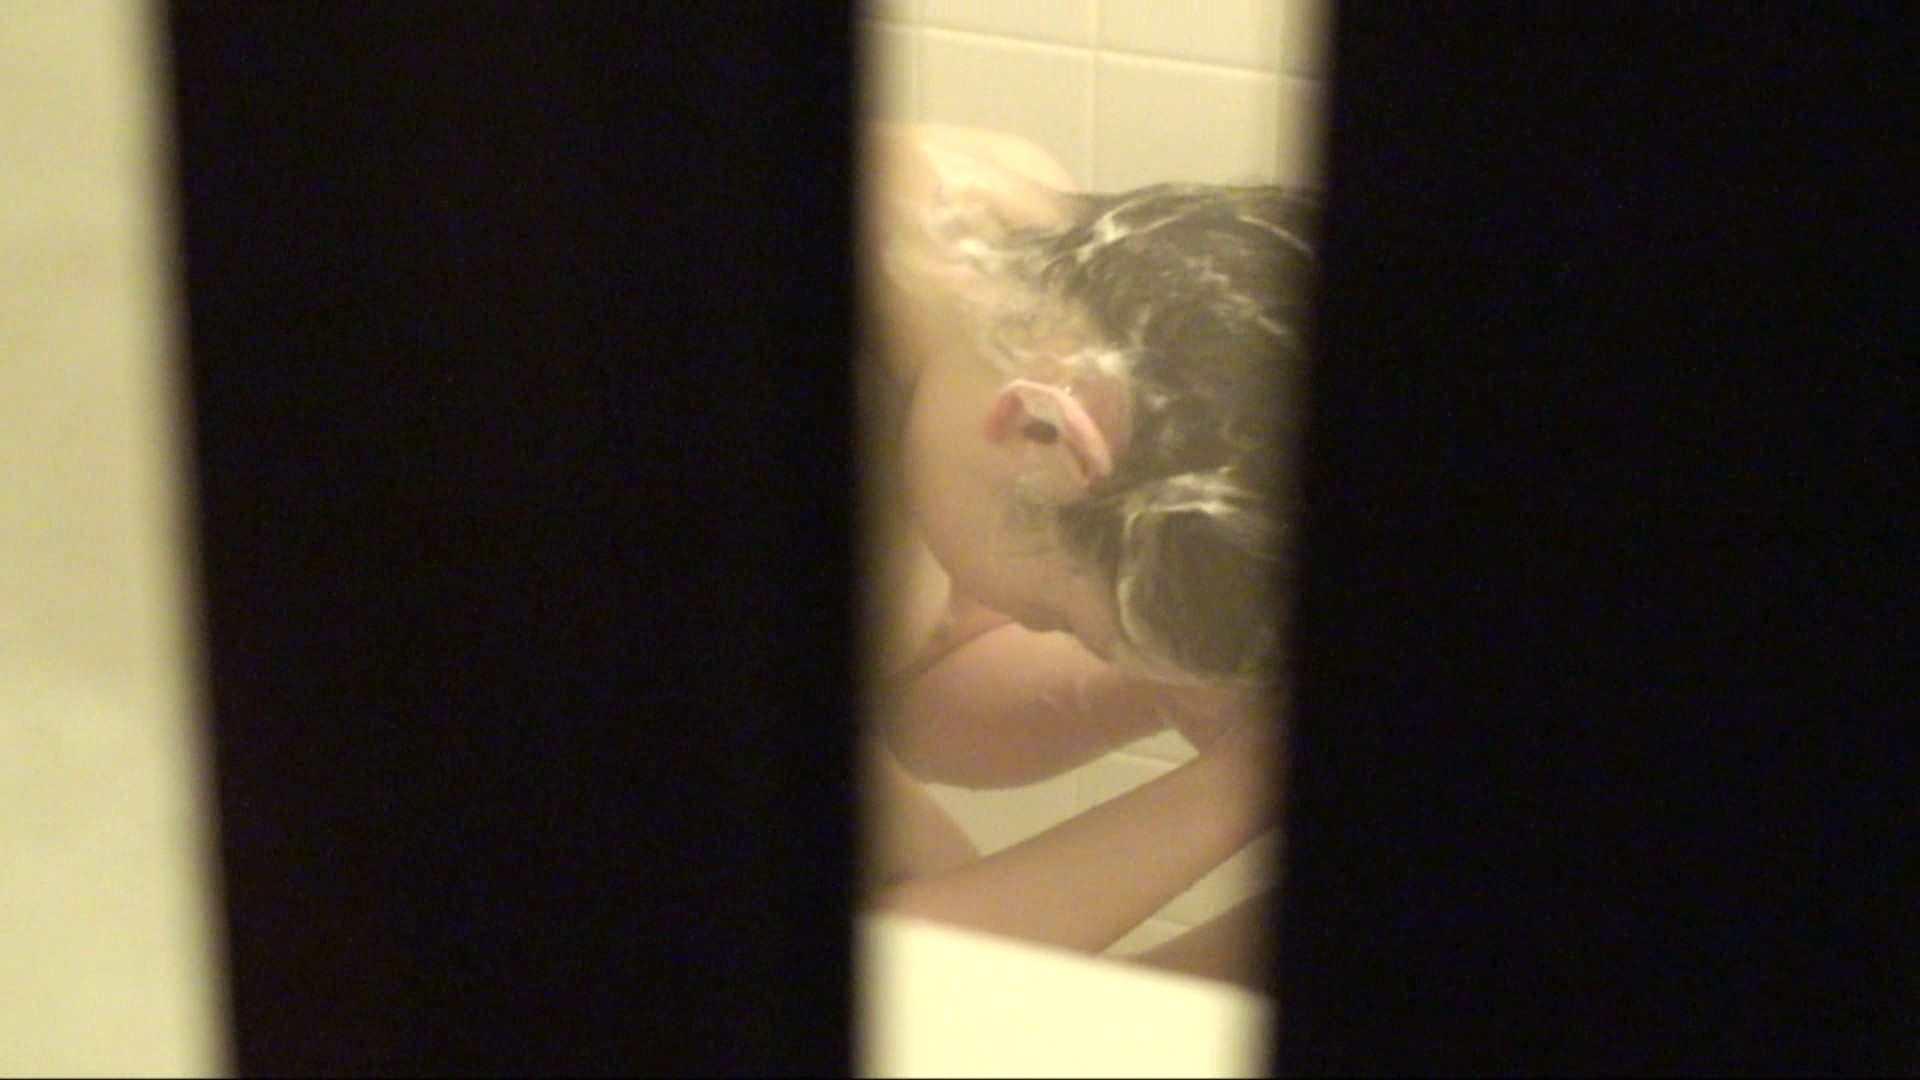 vol.02超可愛すぎる彼女の裸体をハイビジョンで!至近距離での眺め最高! 盗撮 | 美人  107PIX